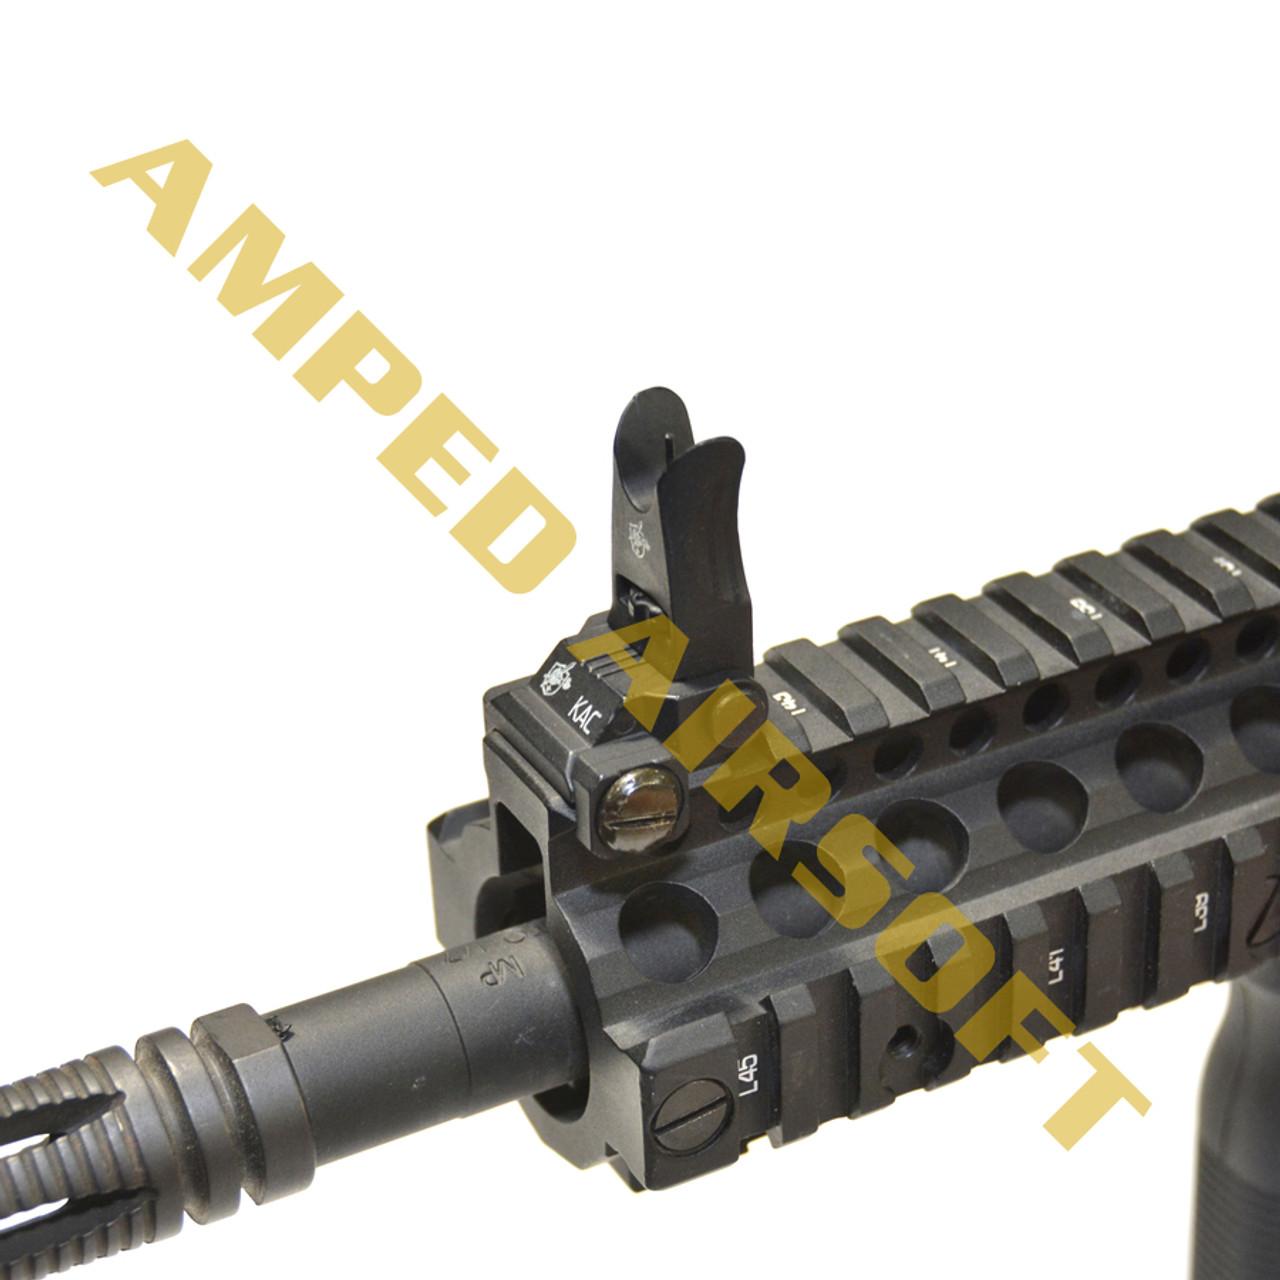 Knights Armament Airsoft - Back Up Iron Sights (Black)